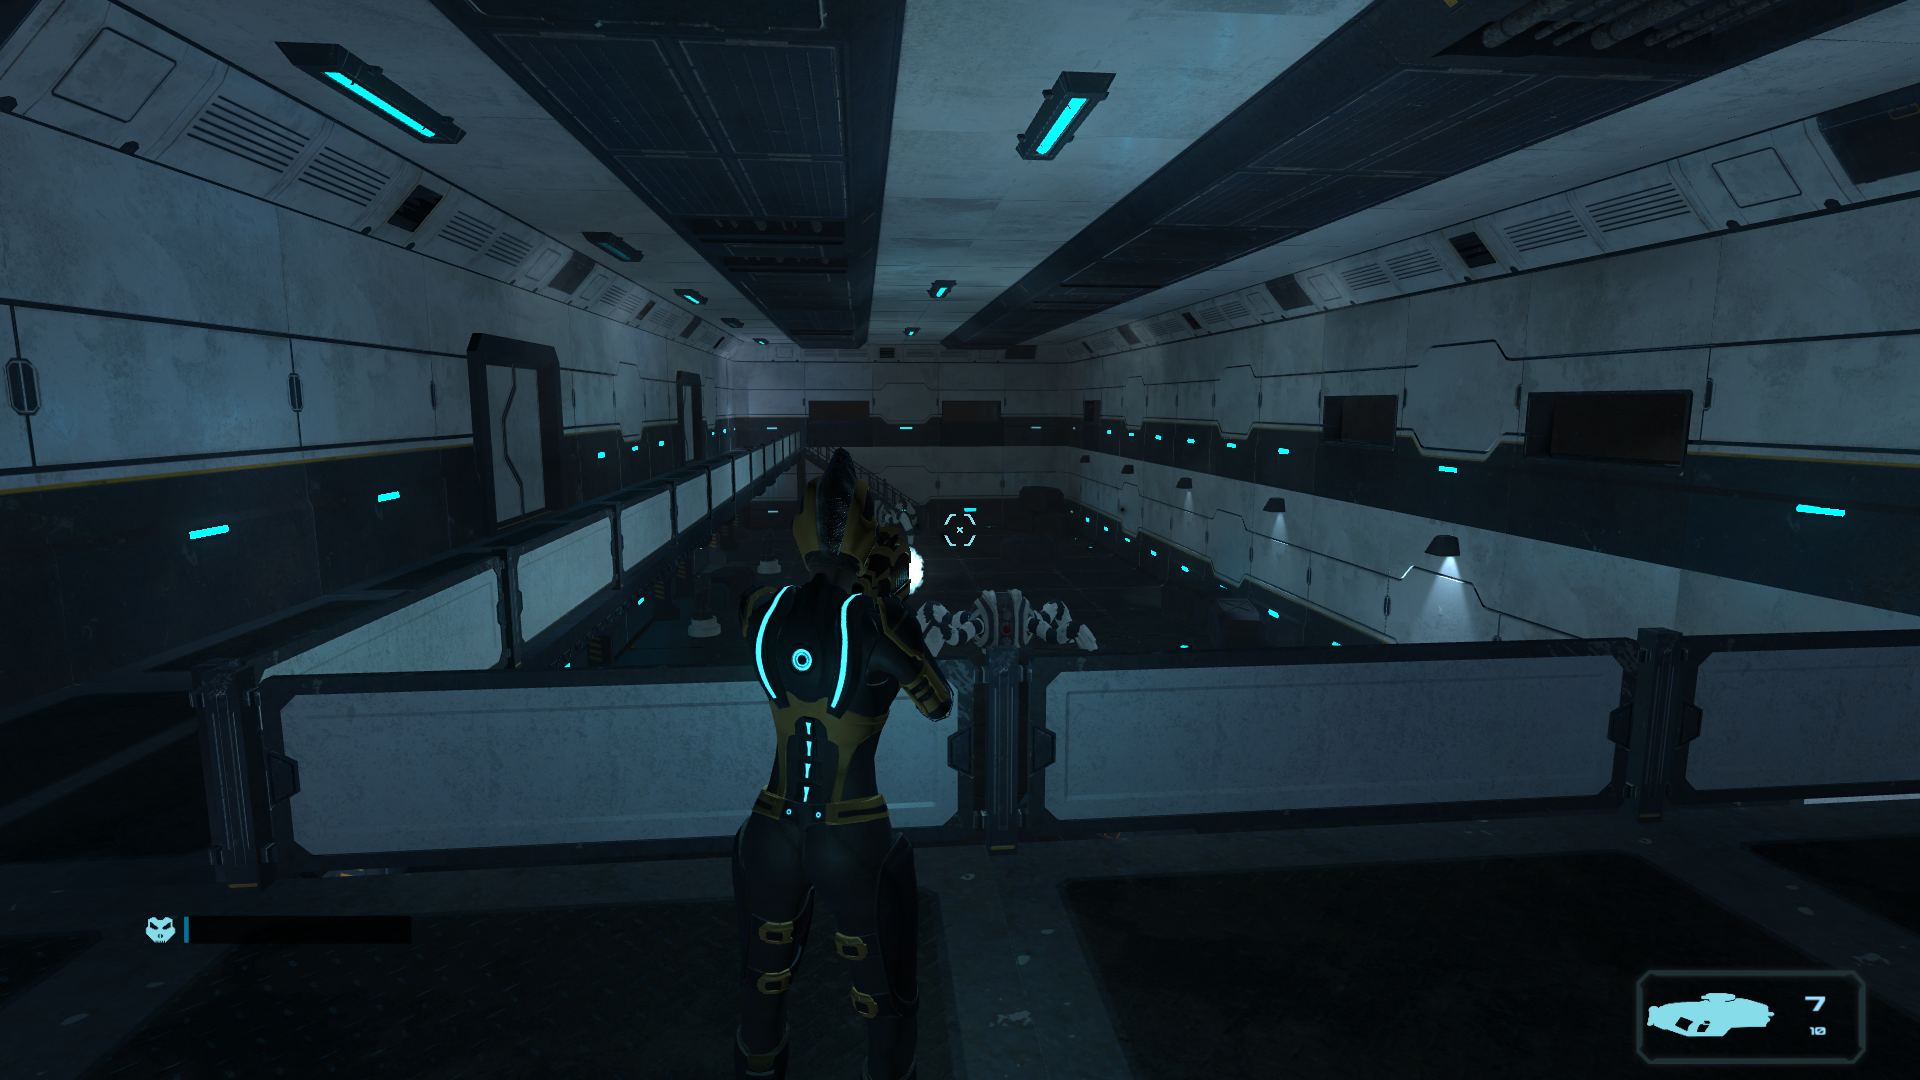 Mech Hunter - 3D Sci-Fi Game